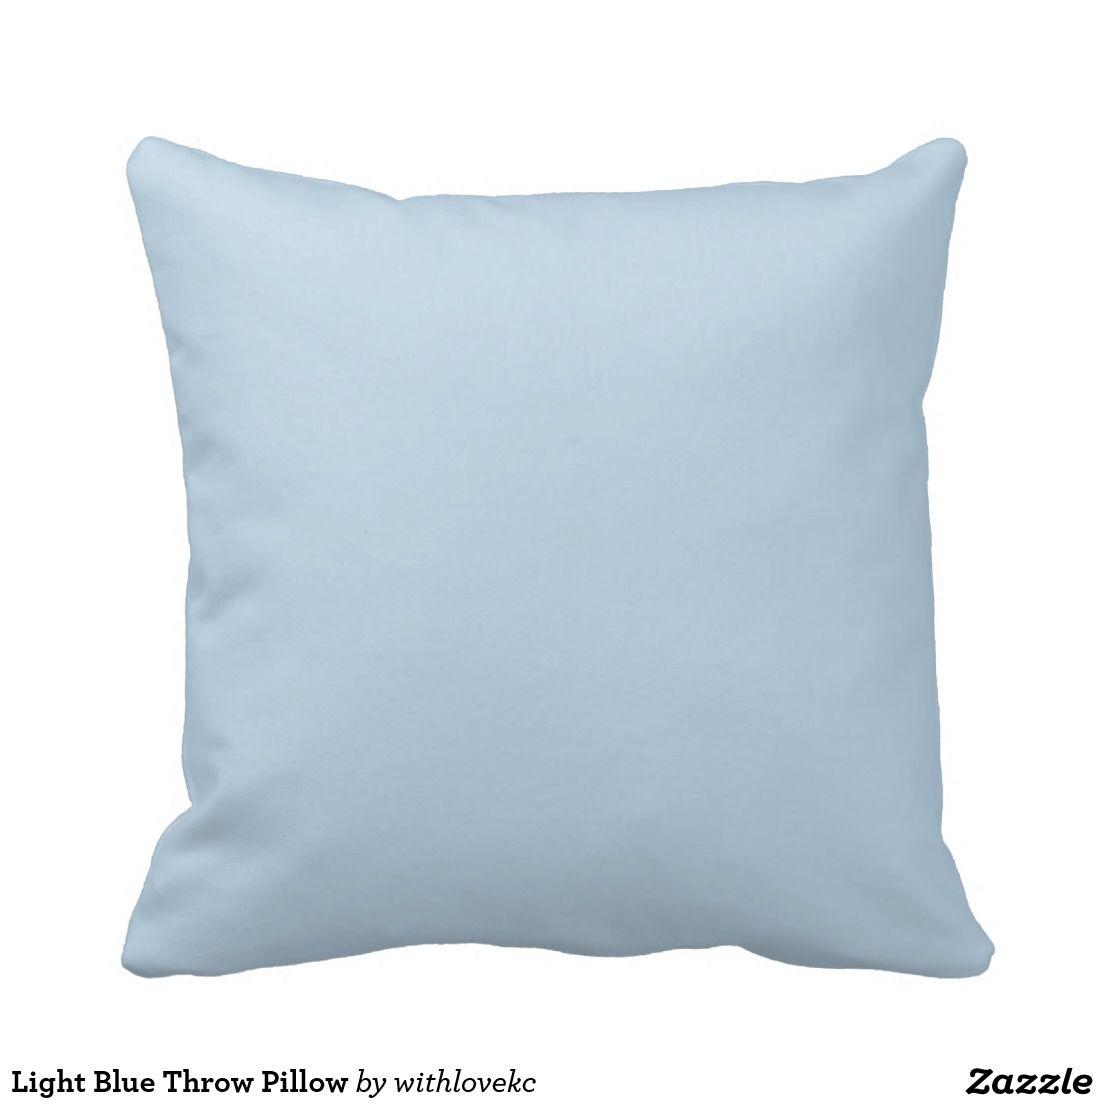 Light Blue Throw Pillow Zazzle